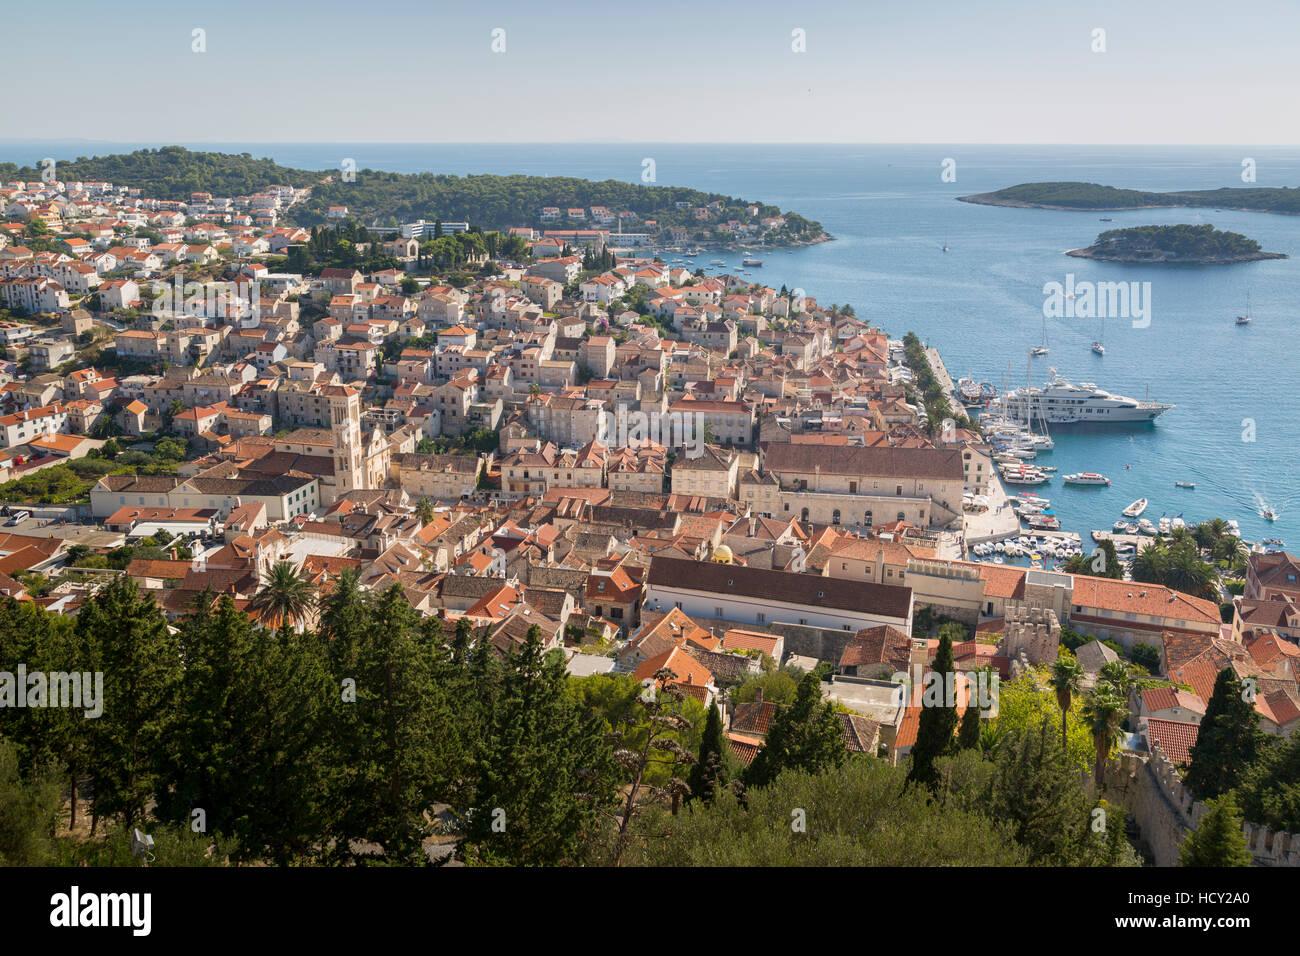 Vistas de Hvar de Fortaleza Española, isla de Hvar, Dalmacia, Croacia Imagen De Stock